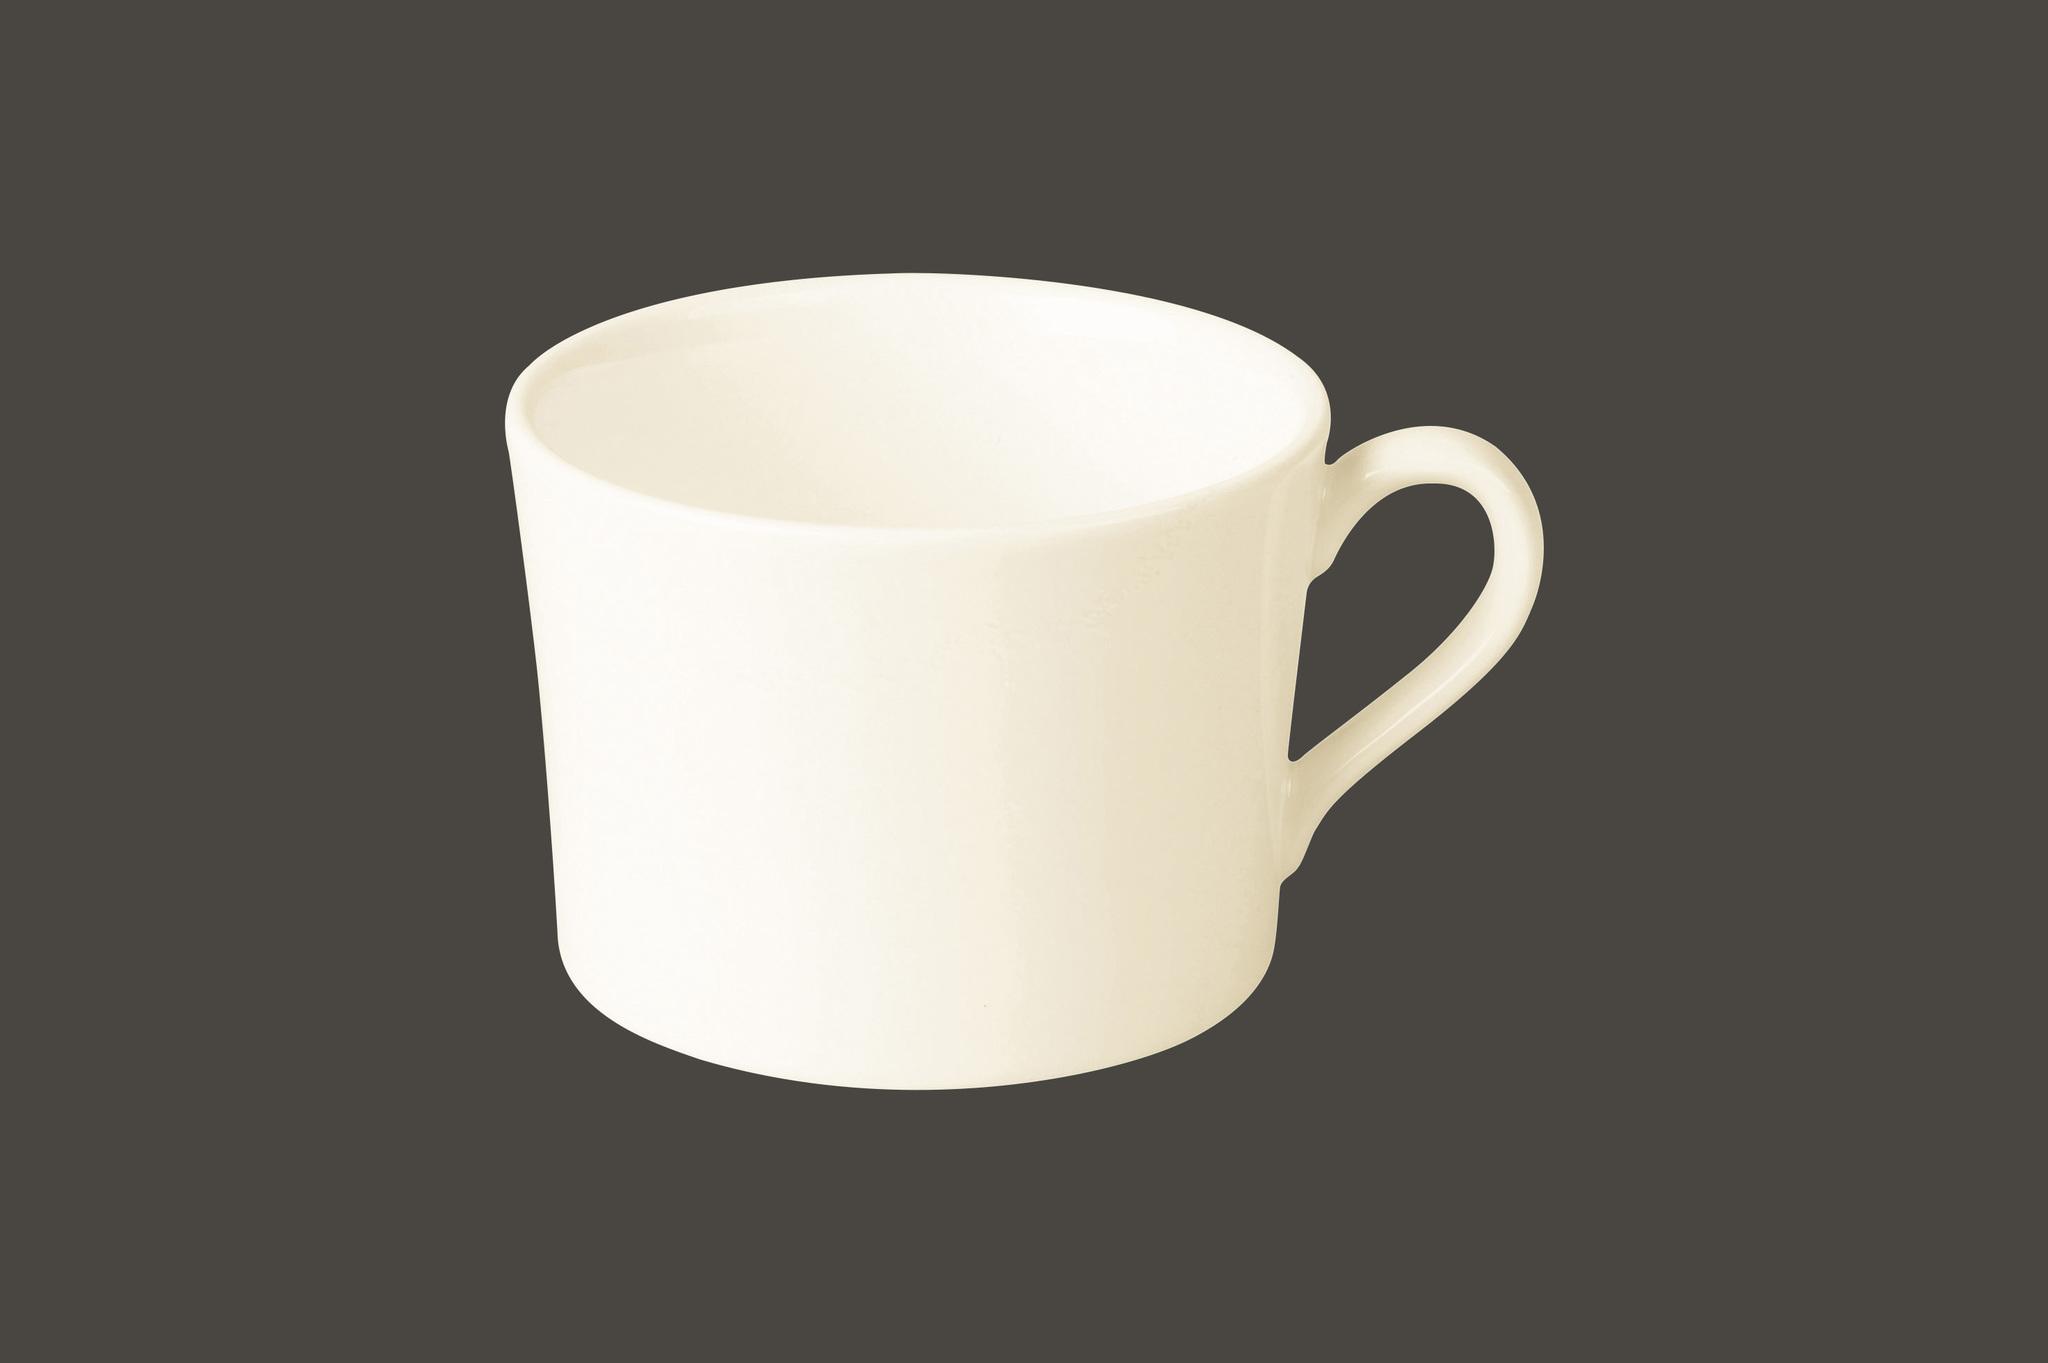 Cappuccino obere 30cl Porzellan Fine Dine RAK